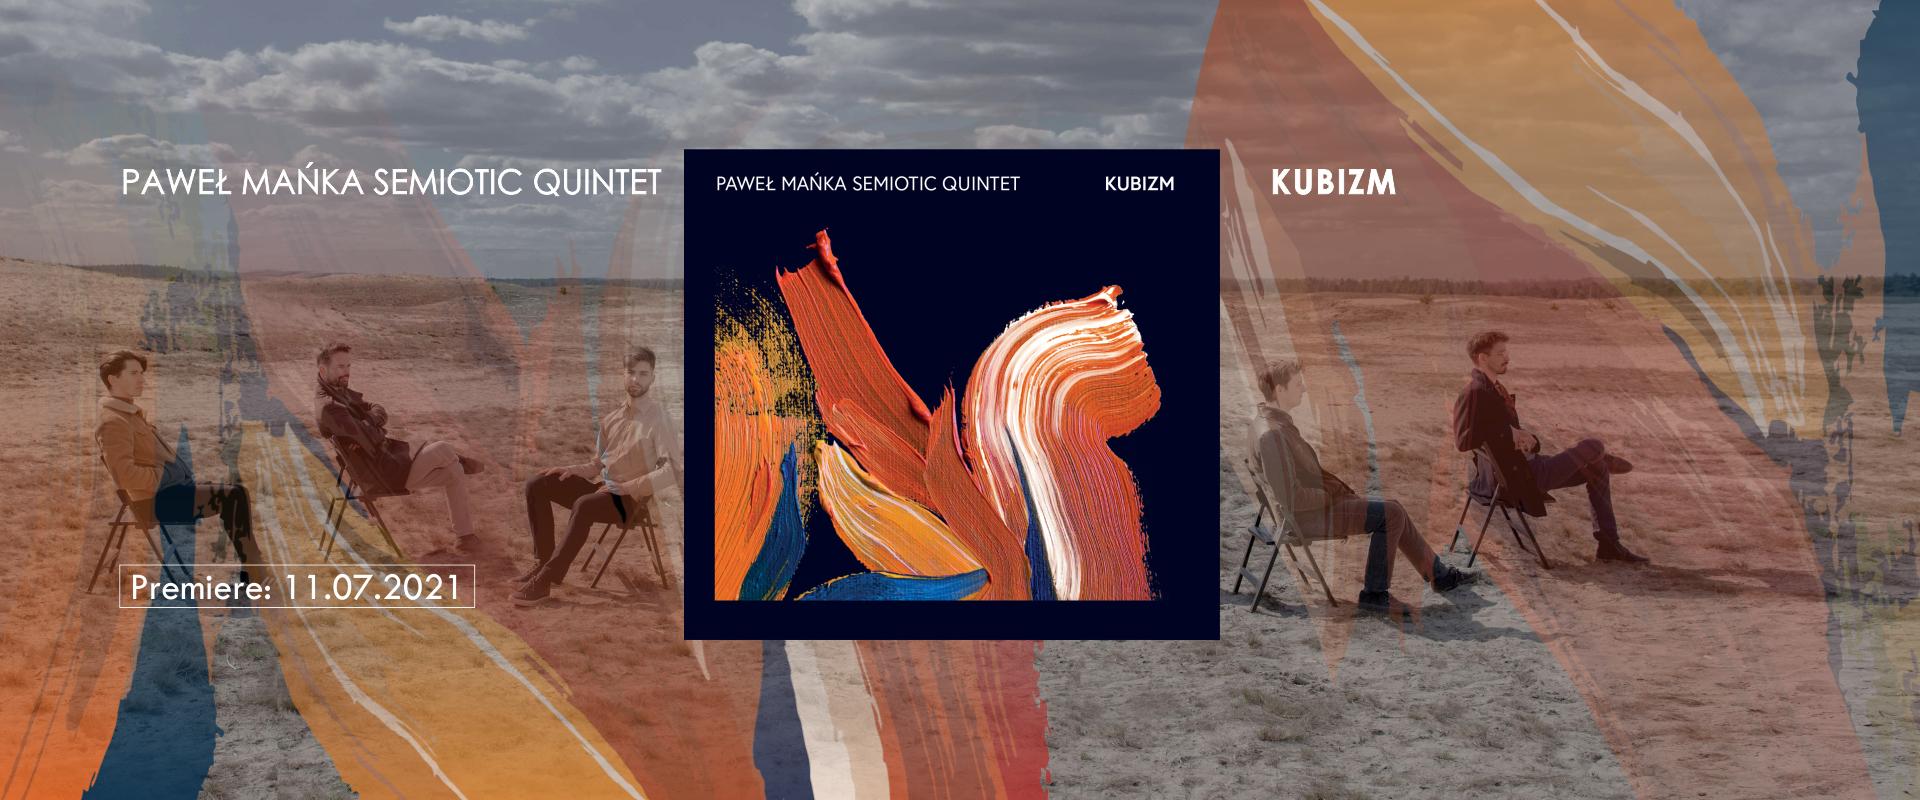 Paweł Mańka Semiotic Quintet - Kubizm alt